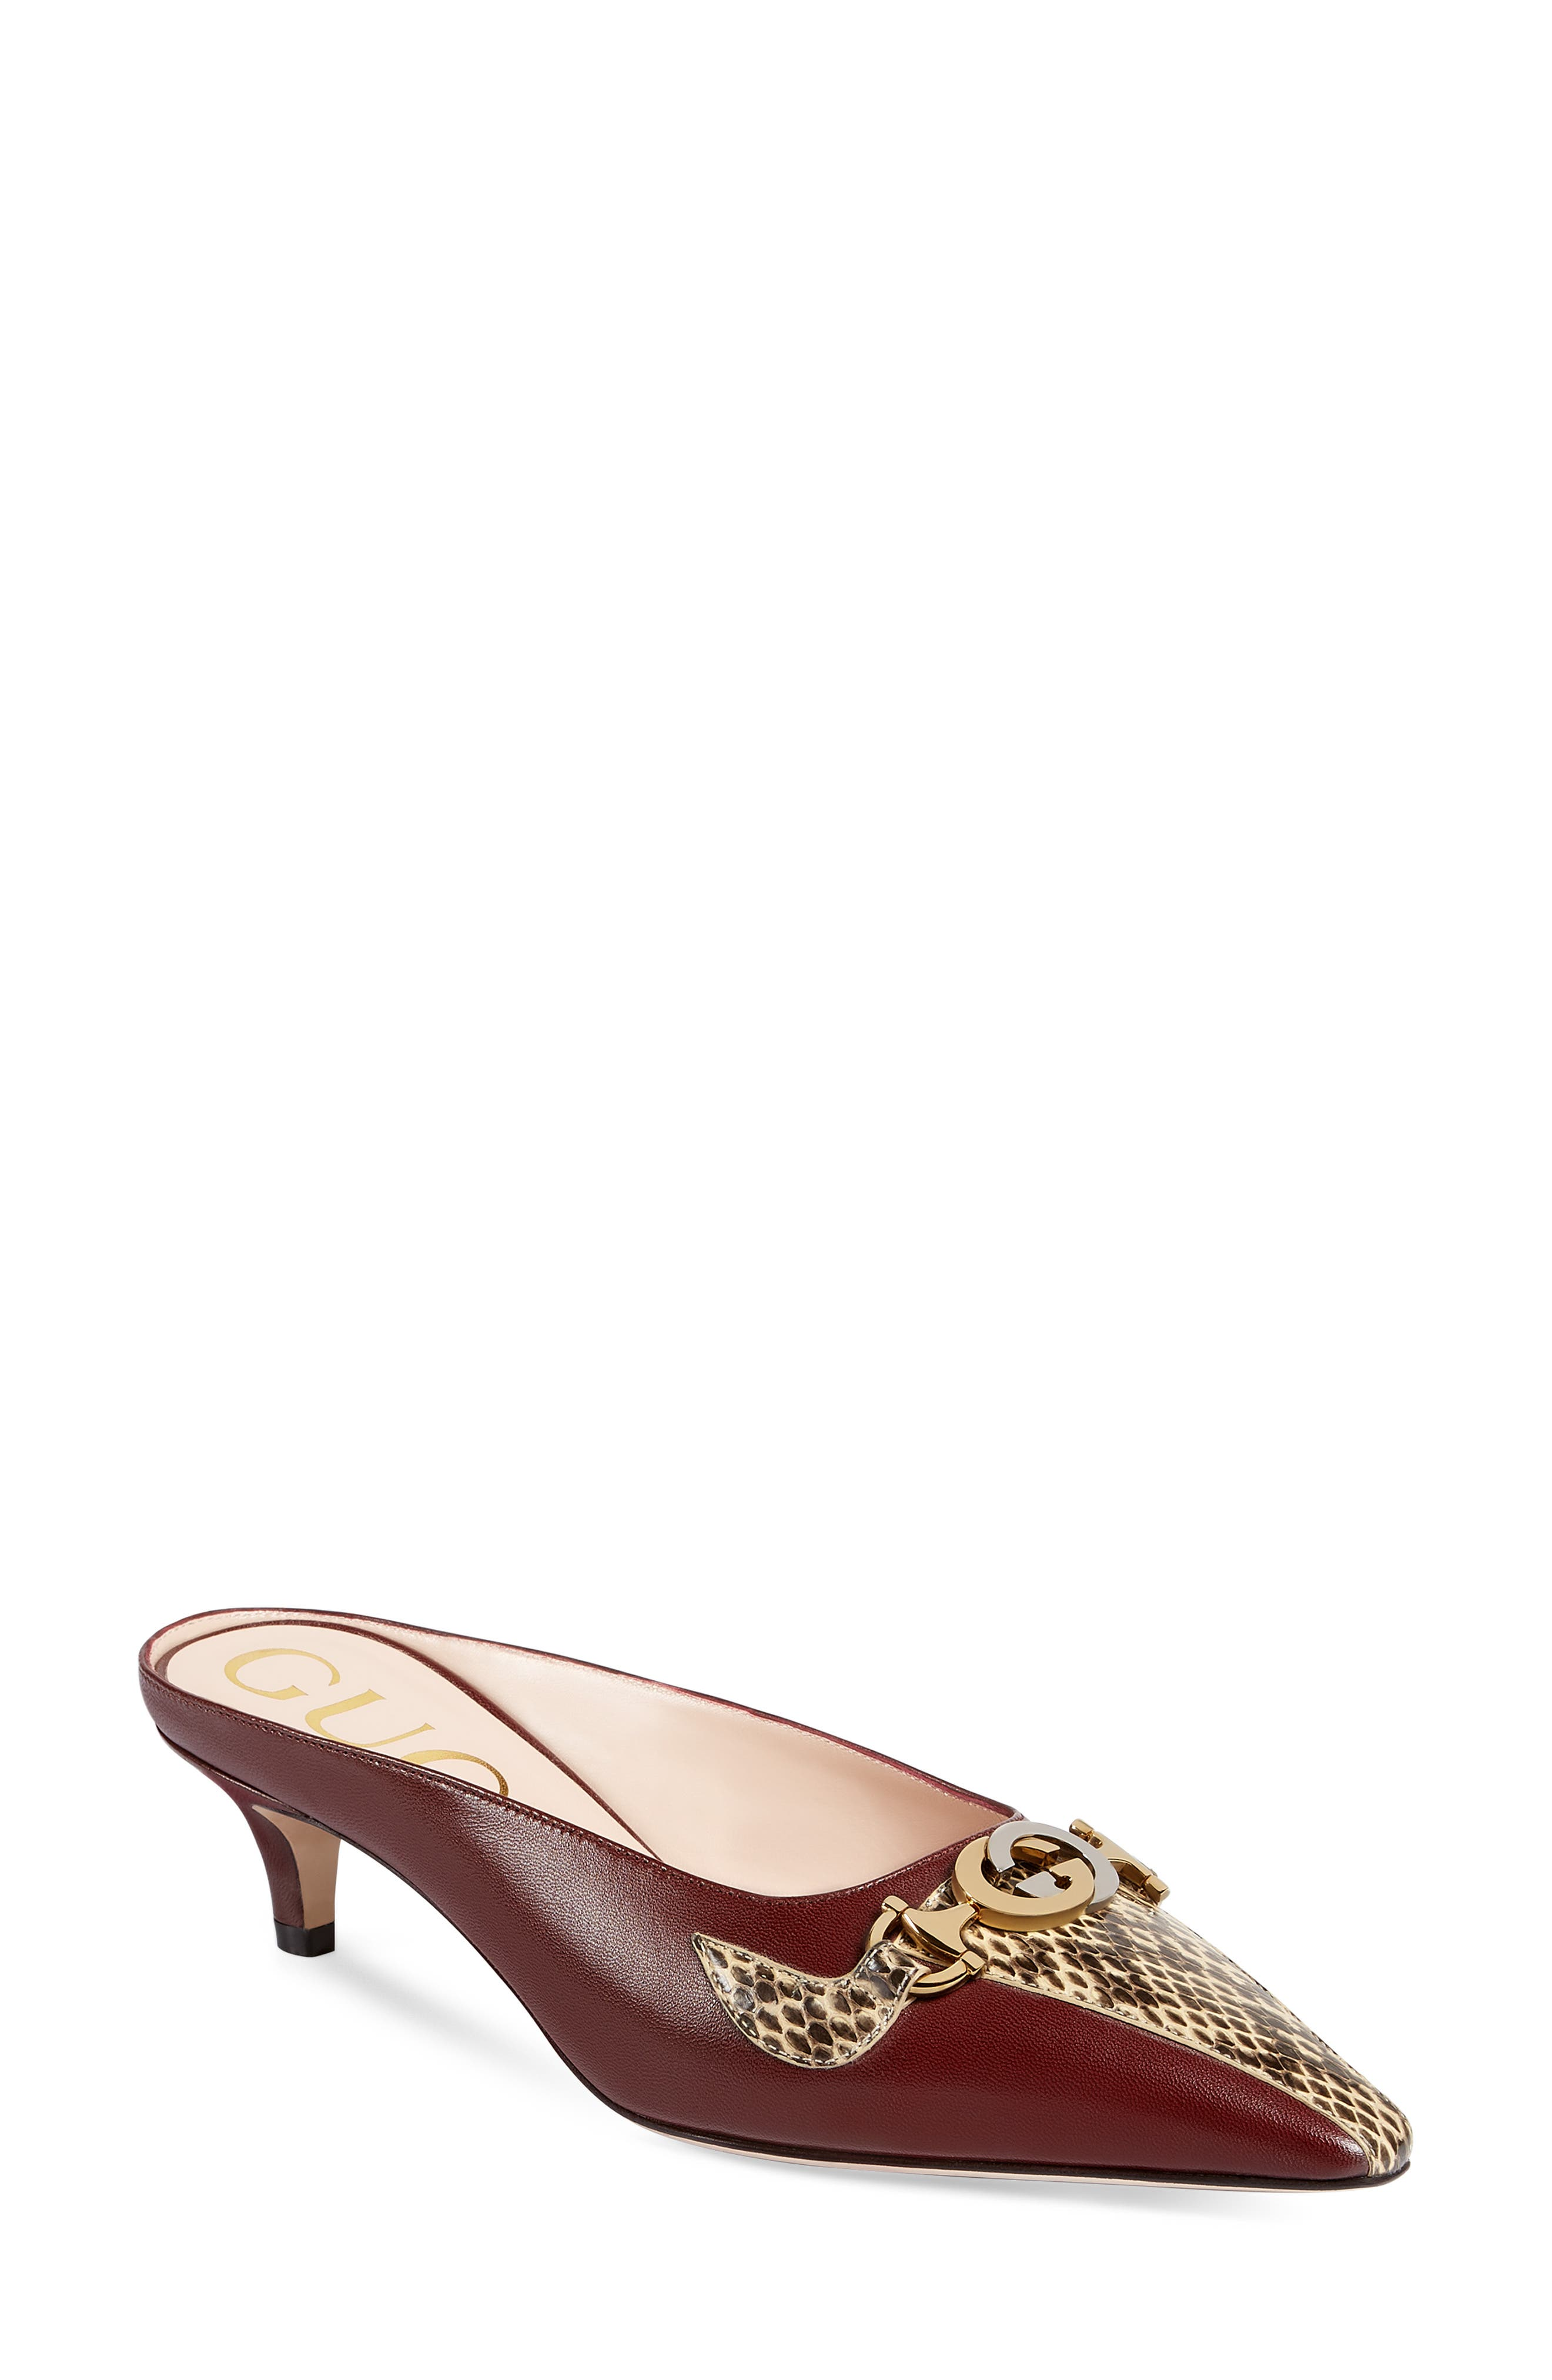 Gucci Zumi Leather & Genuine Snakeskin Pointy Toe Mule, Burgundy